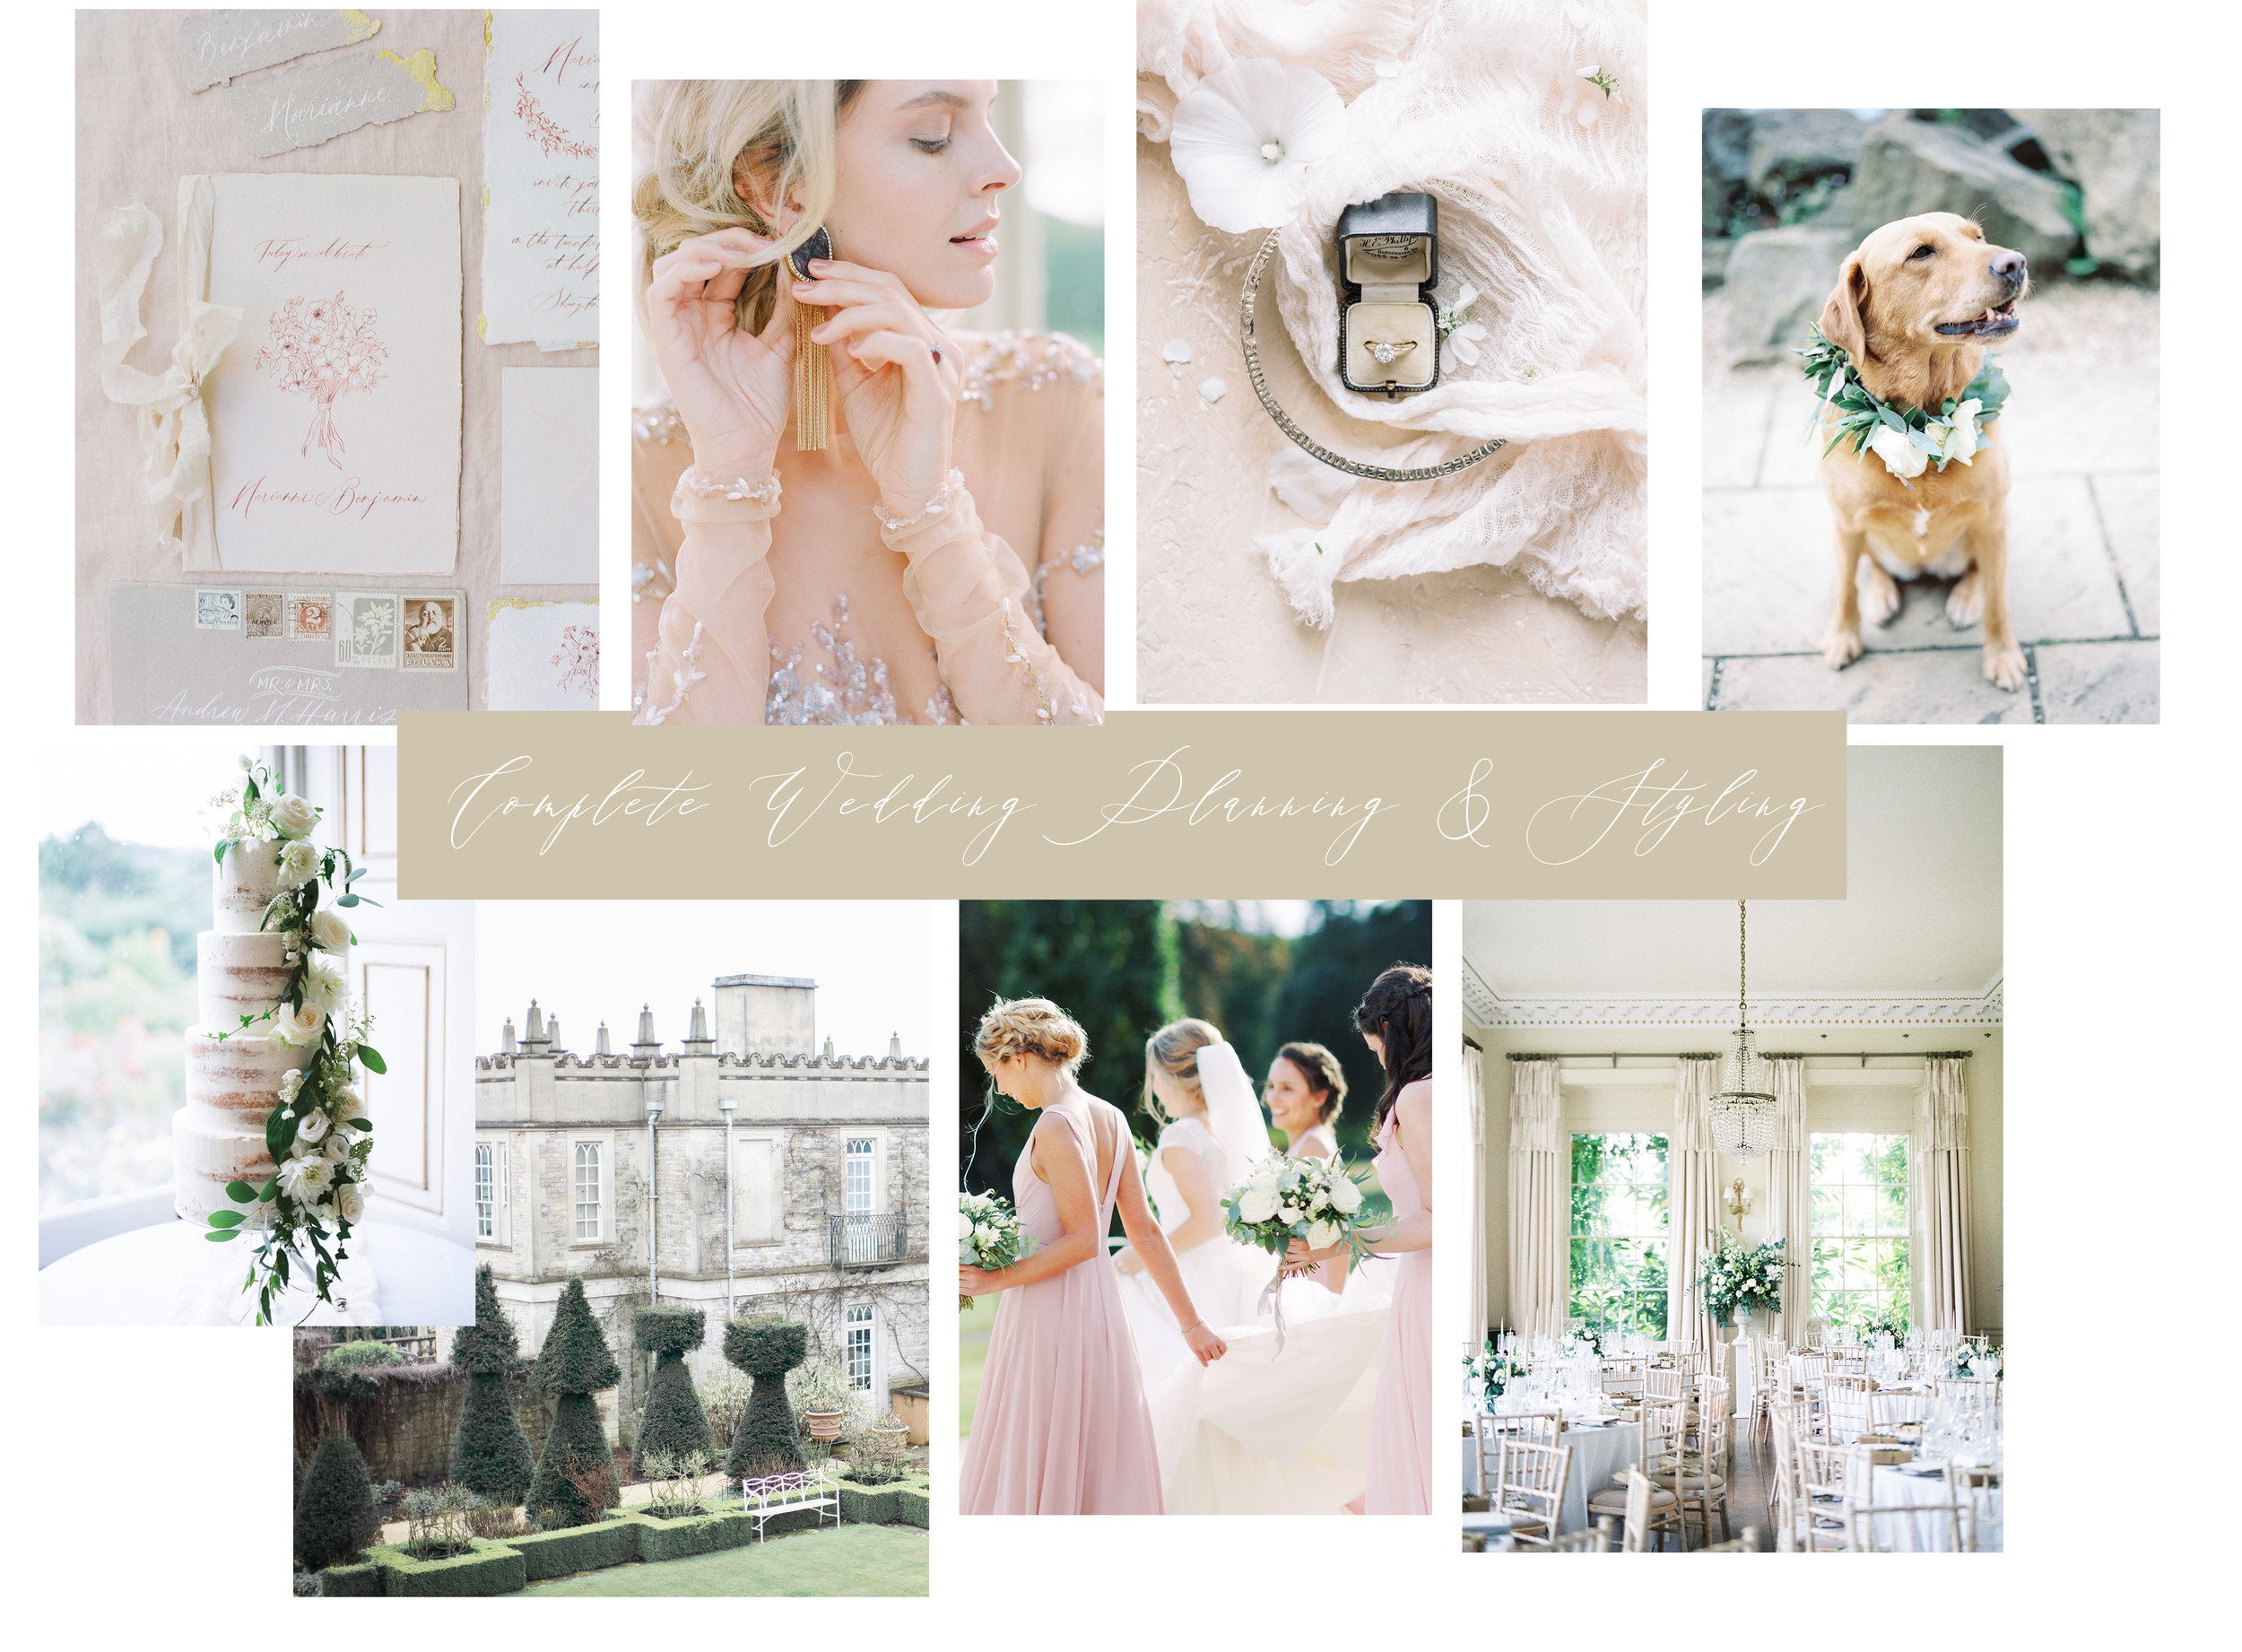 Lily & Sage | Luxury Wedding Planner | Wedding Planner UK Wedding Planner Cotswolds Wedding Planner London Wedding Planner Europe Cotswolds Wedding Planner UK Wedding Planner Weddin Stylist | Complete Wedding Planning & Styling.jpg